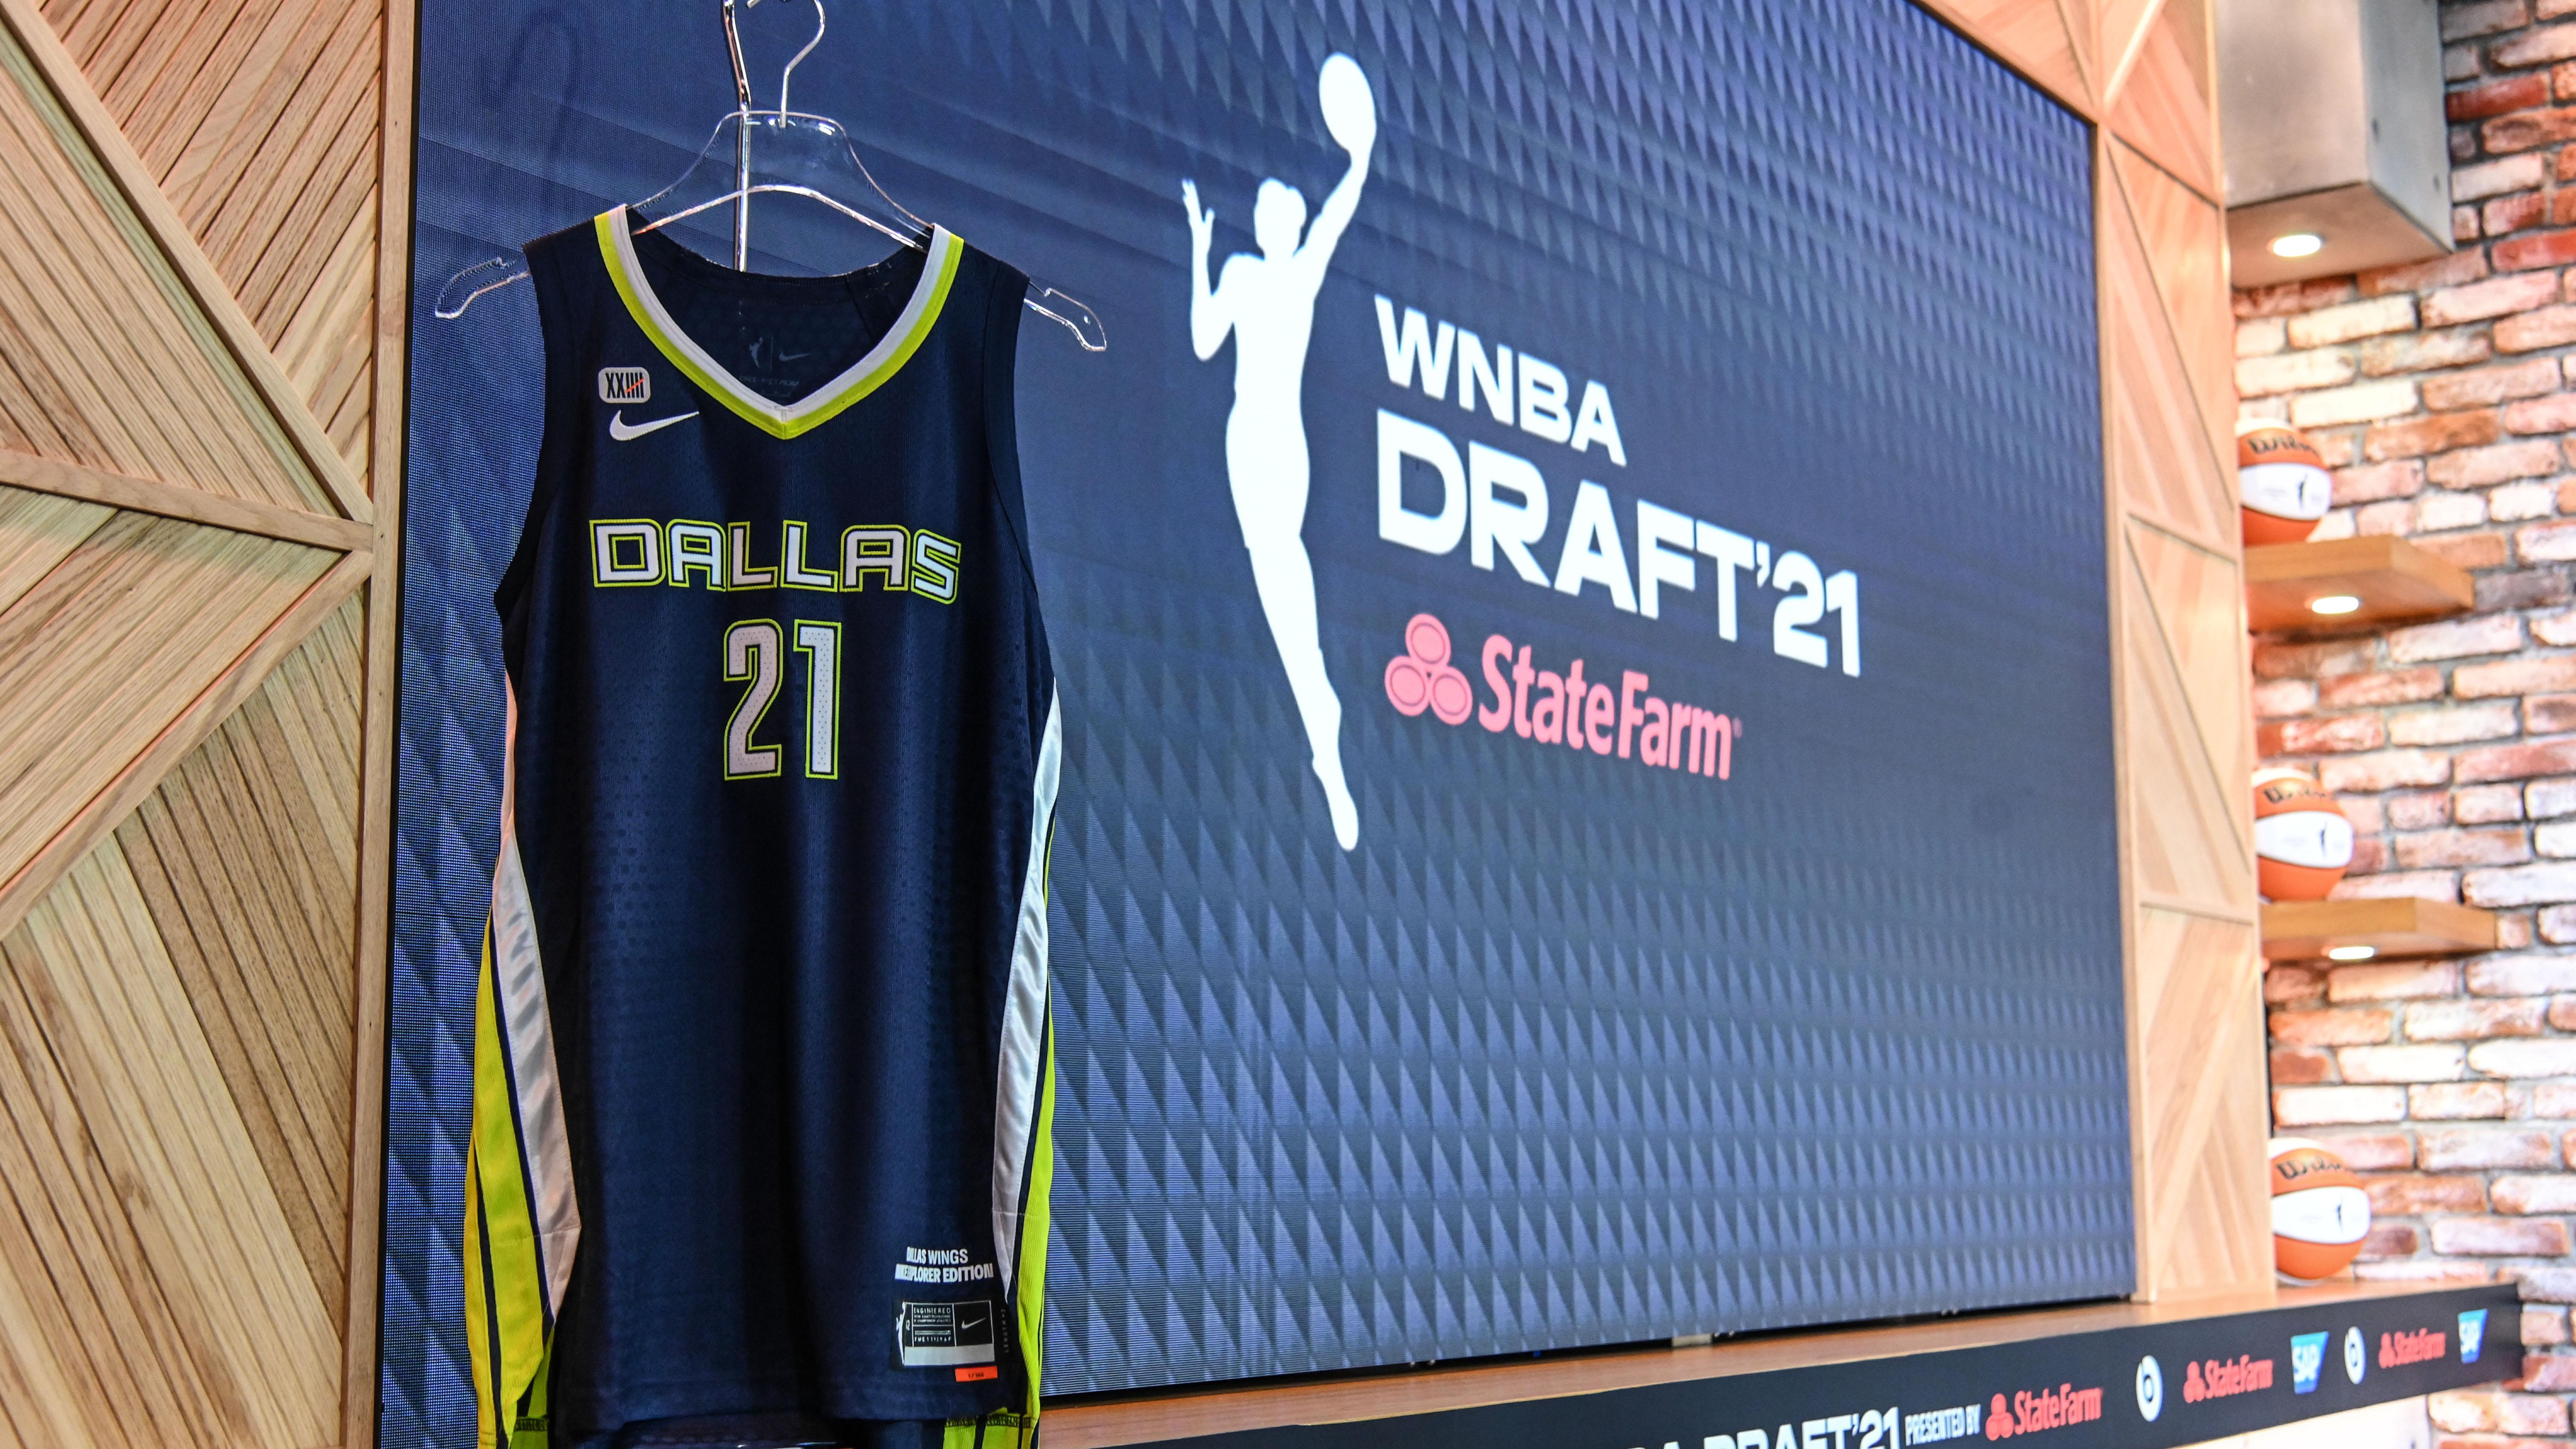 2021 WNBA Draft: Evans' fall is Wings' gain, international players make a splash